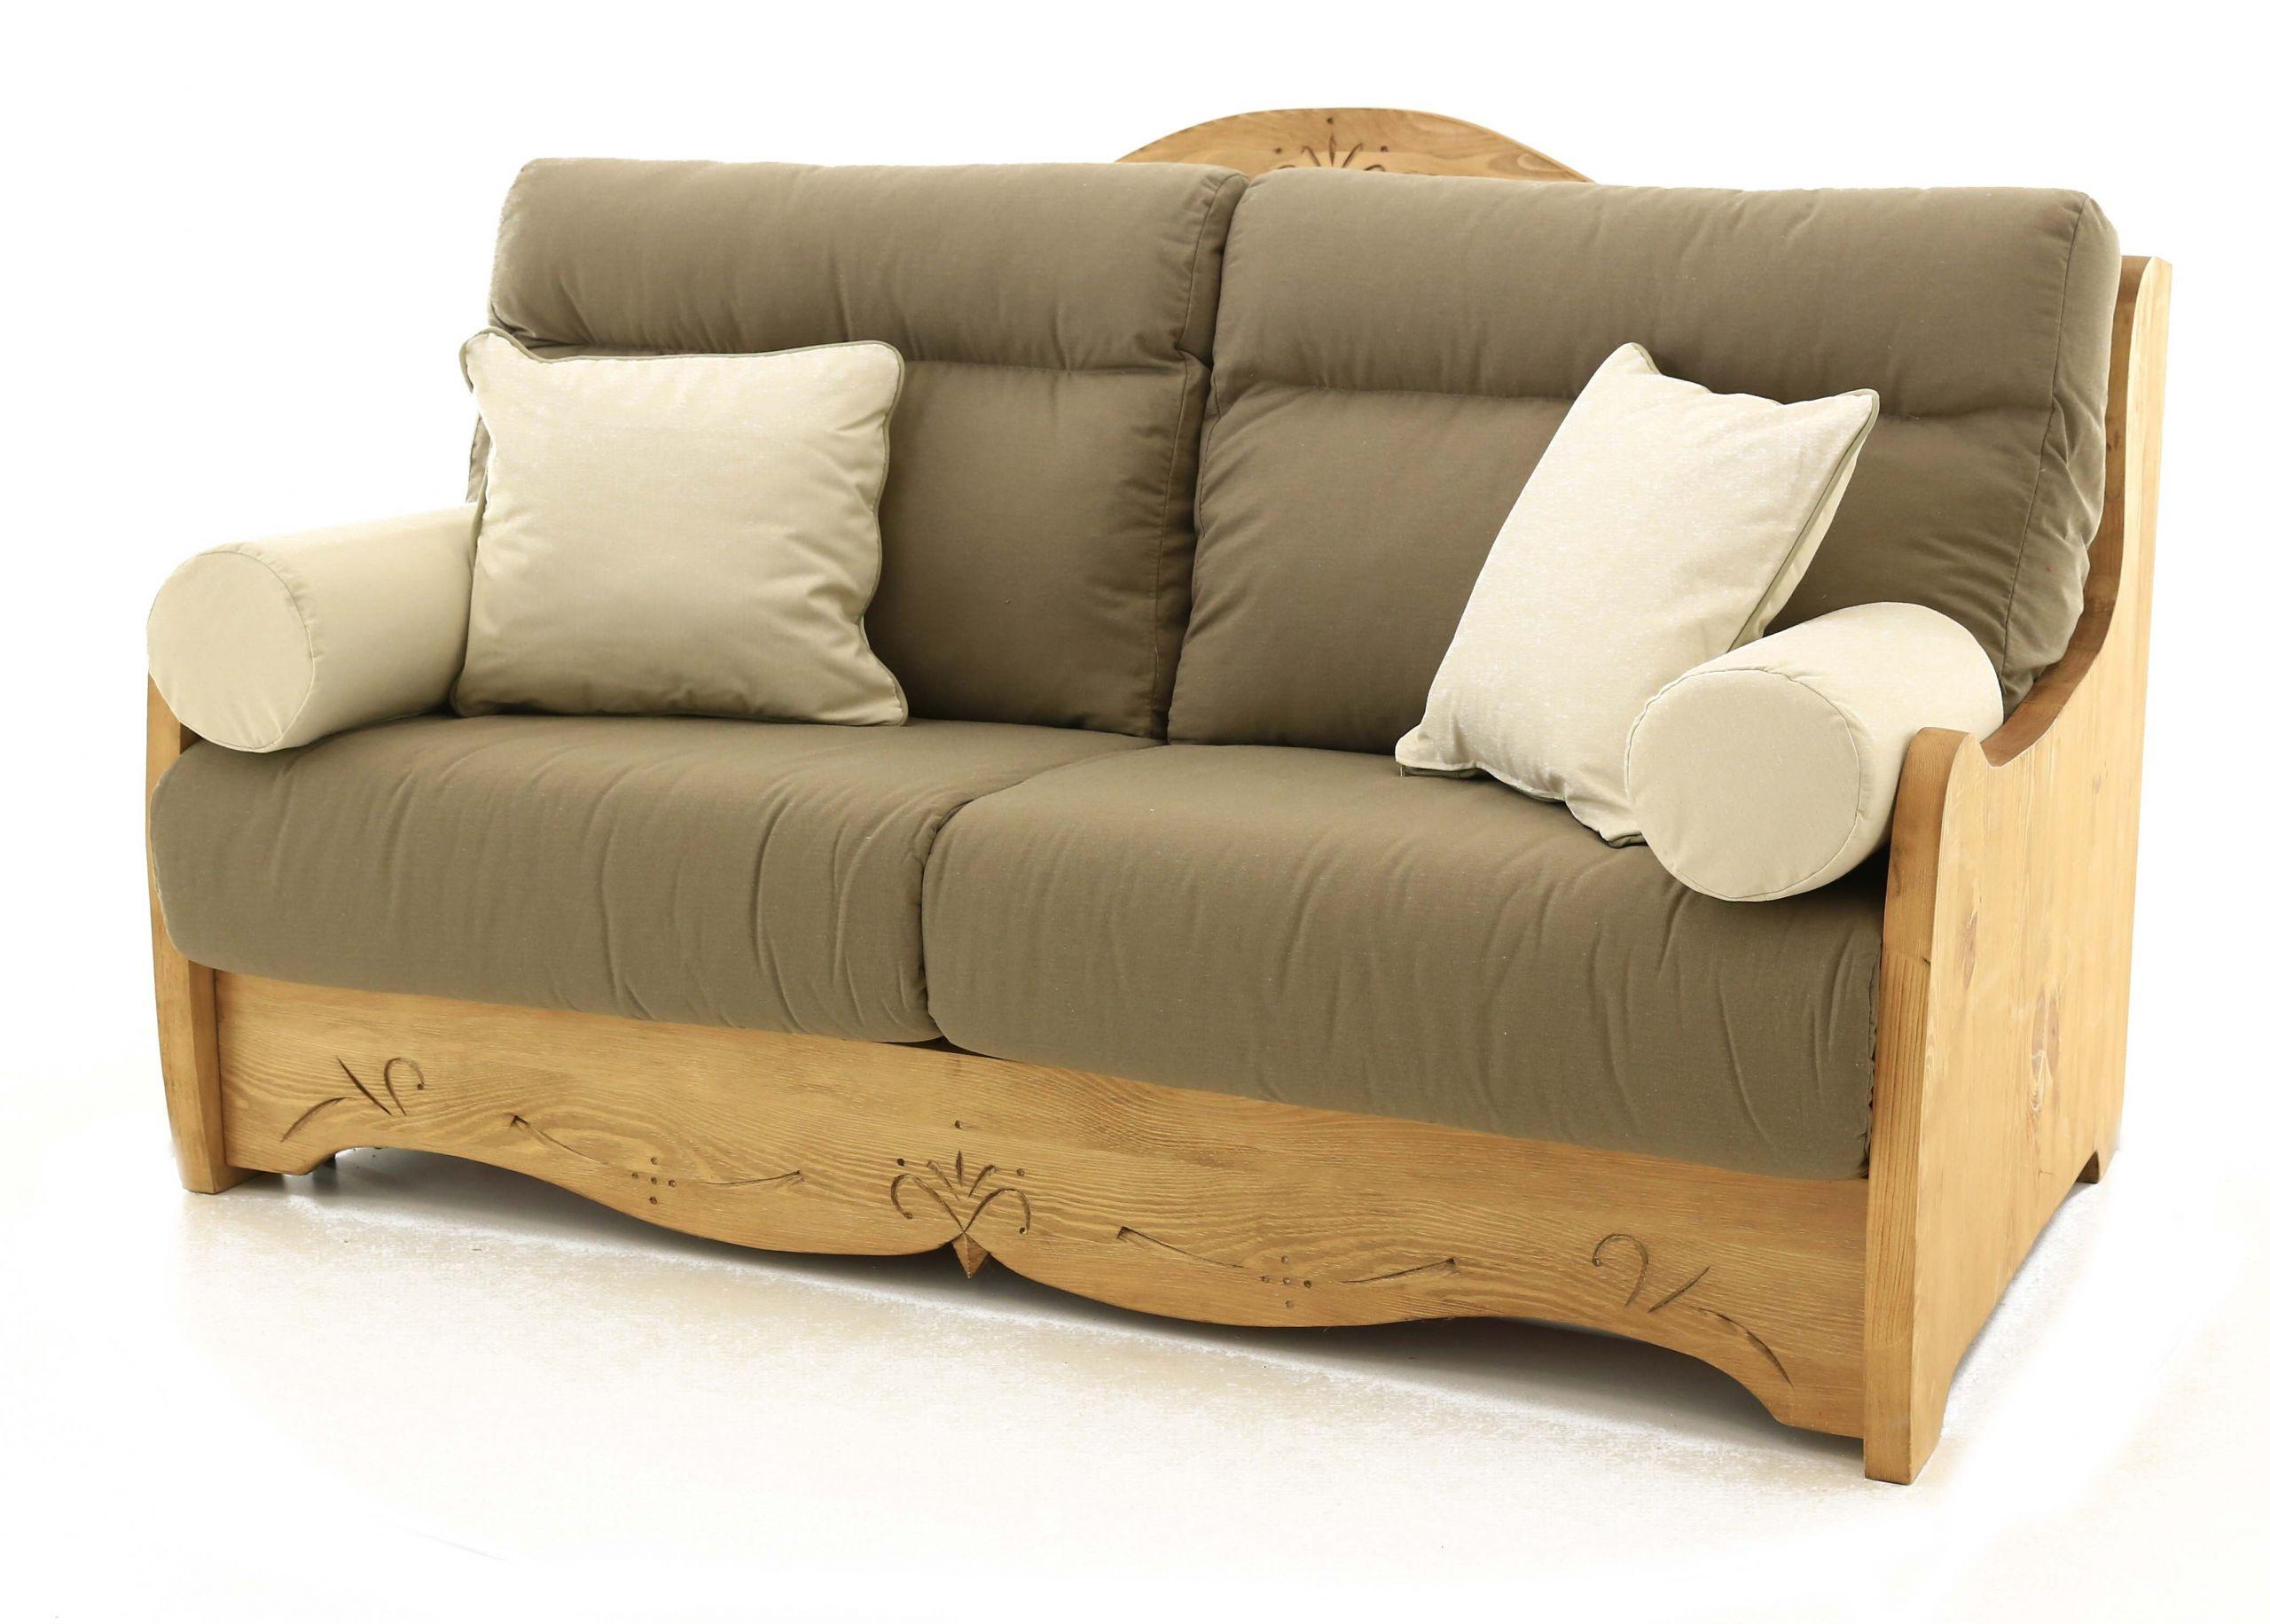 Canapé convertible 160 x 200 cm en pin massif Liso